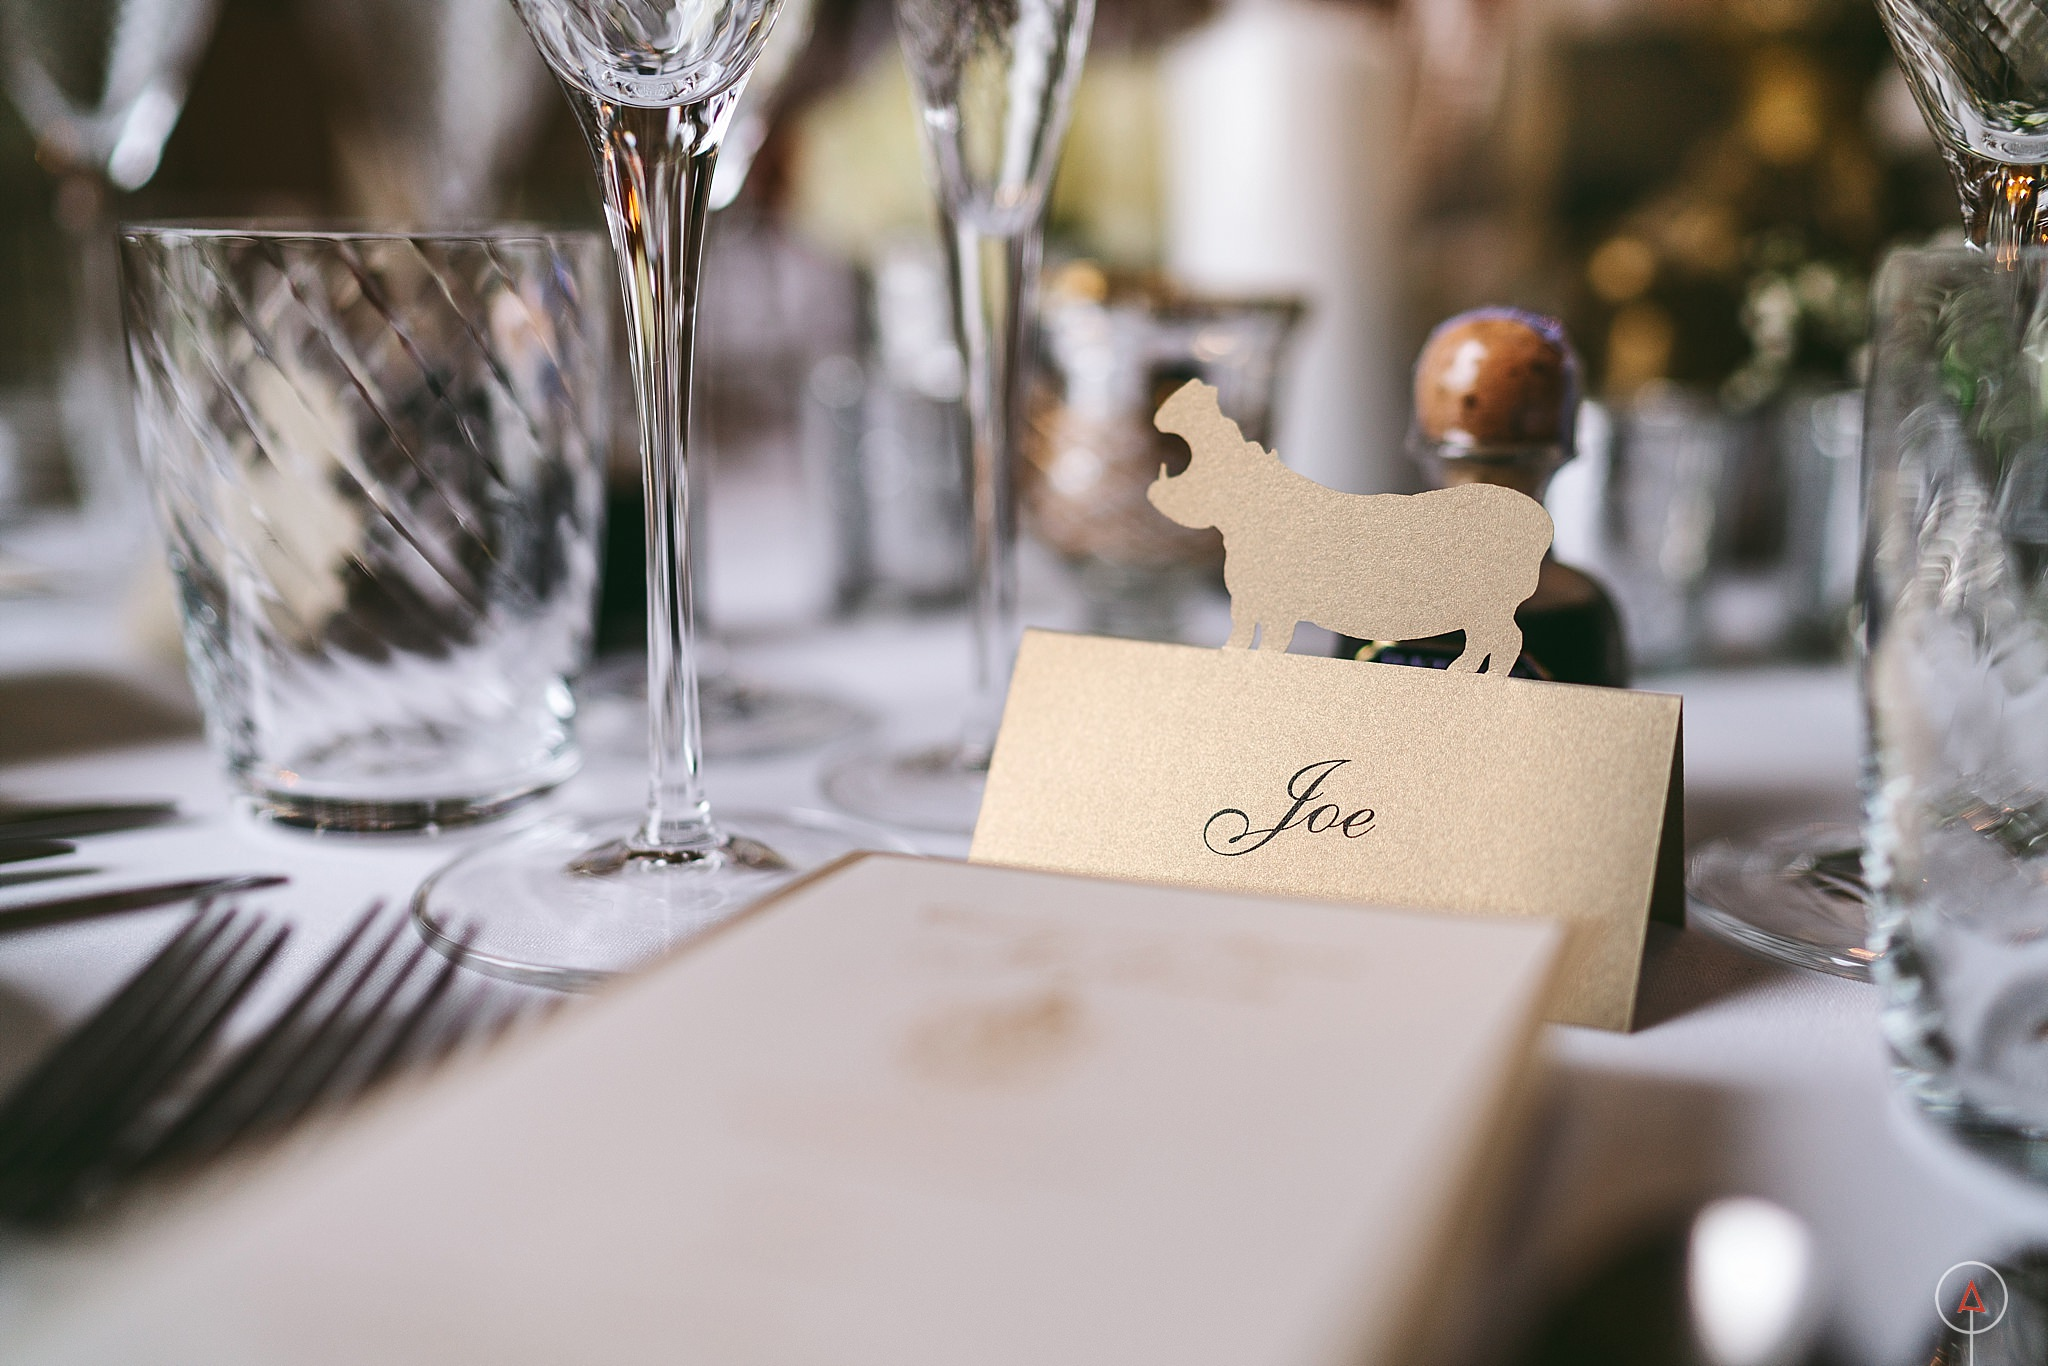 cardiff-wedding-photographer-aga-tomaszek_0286